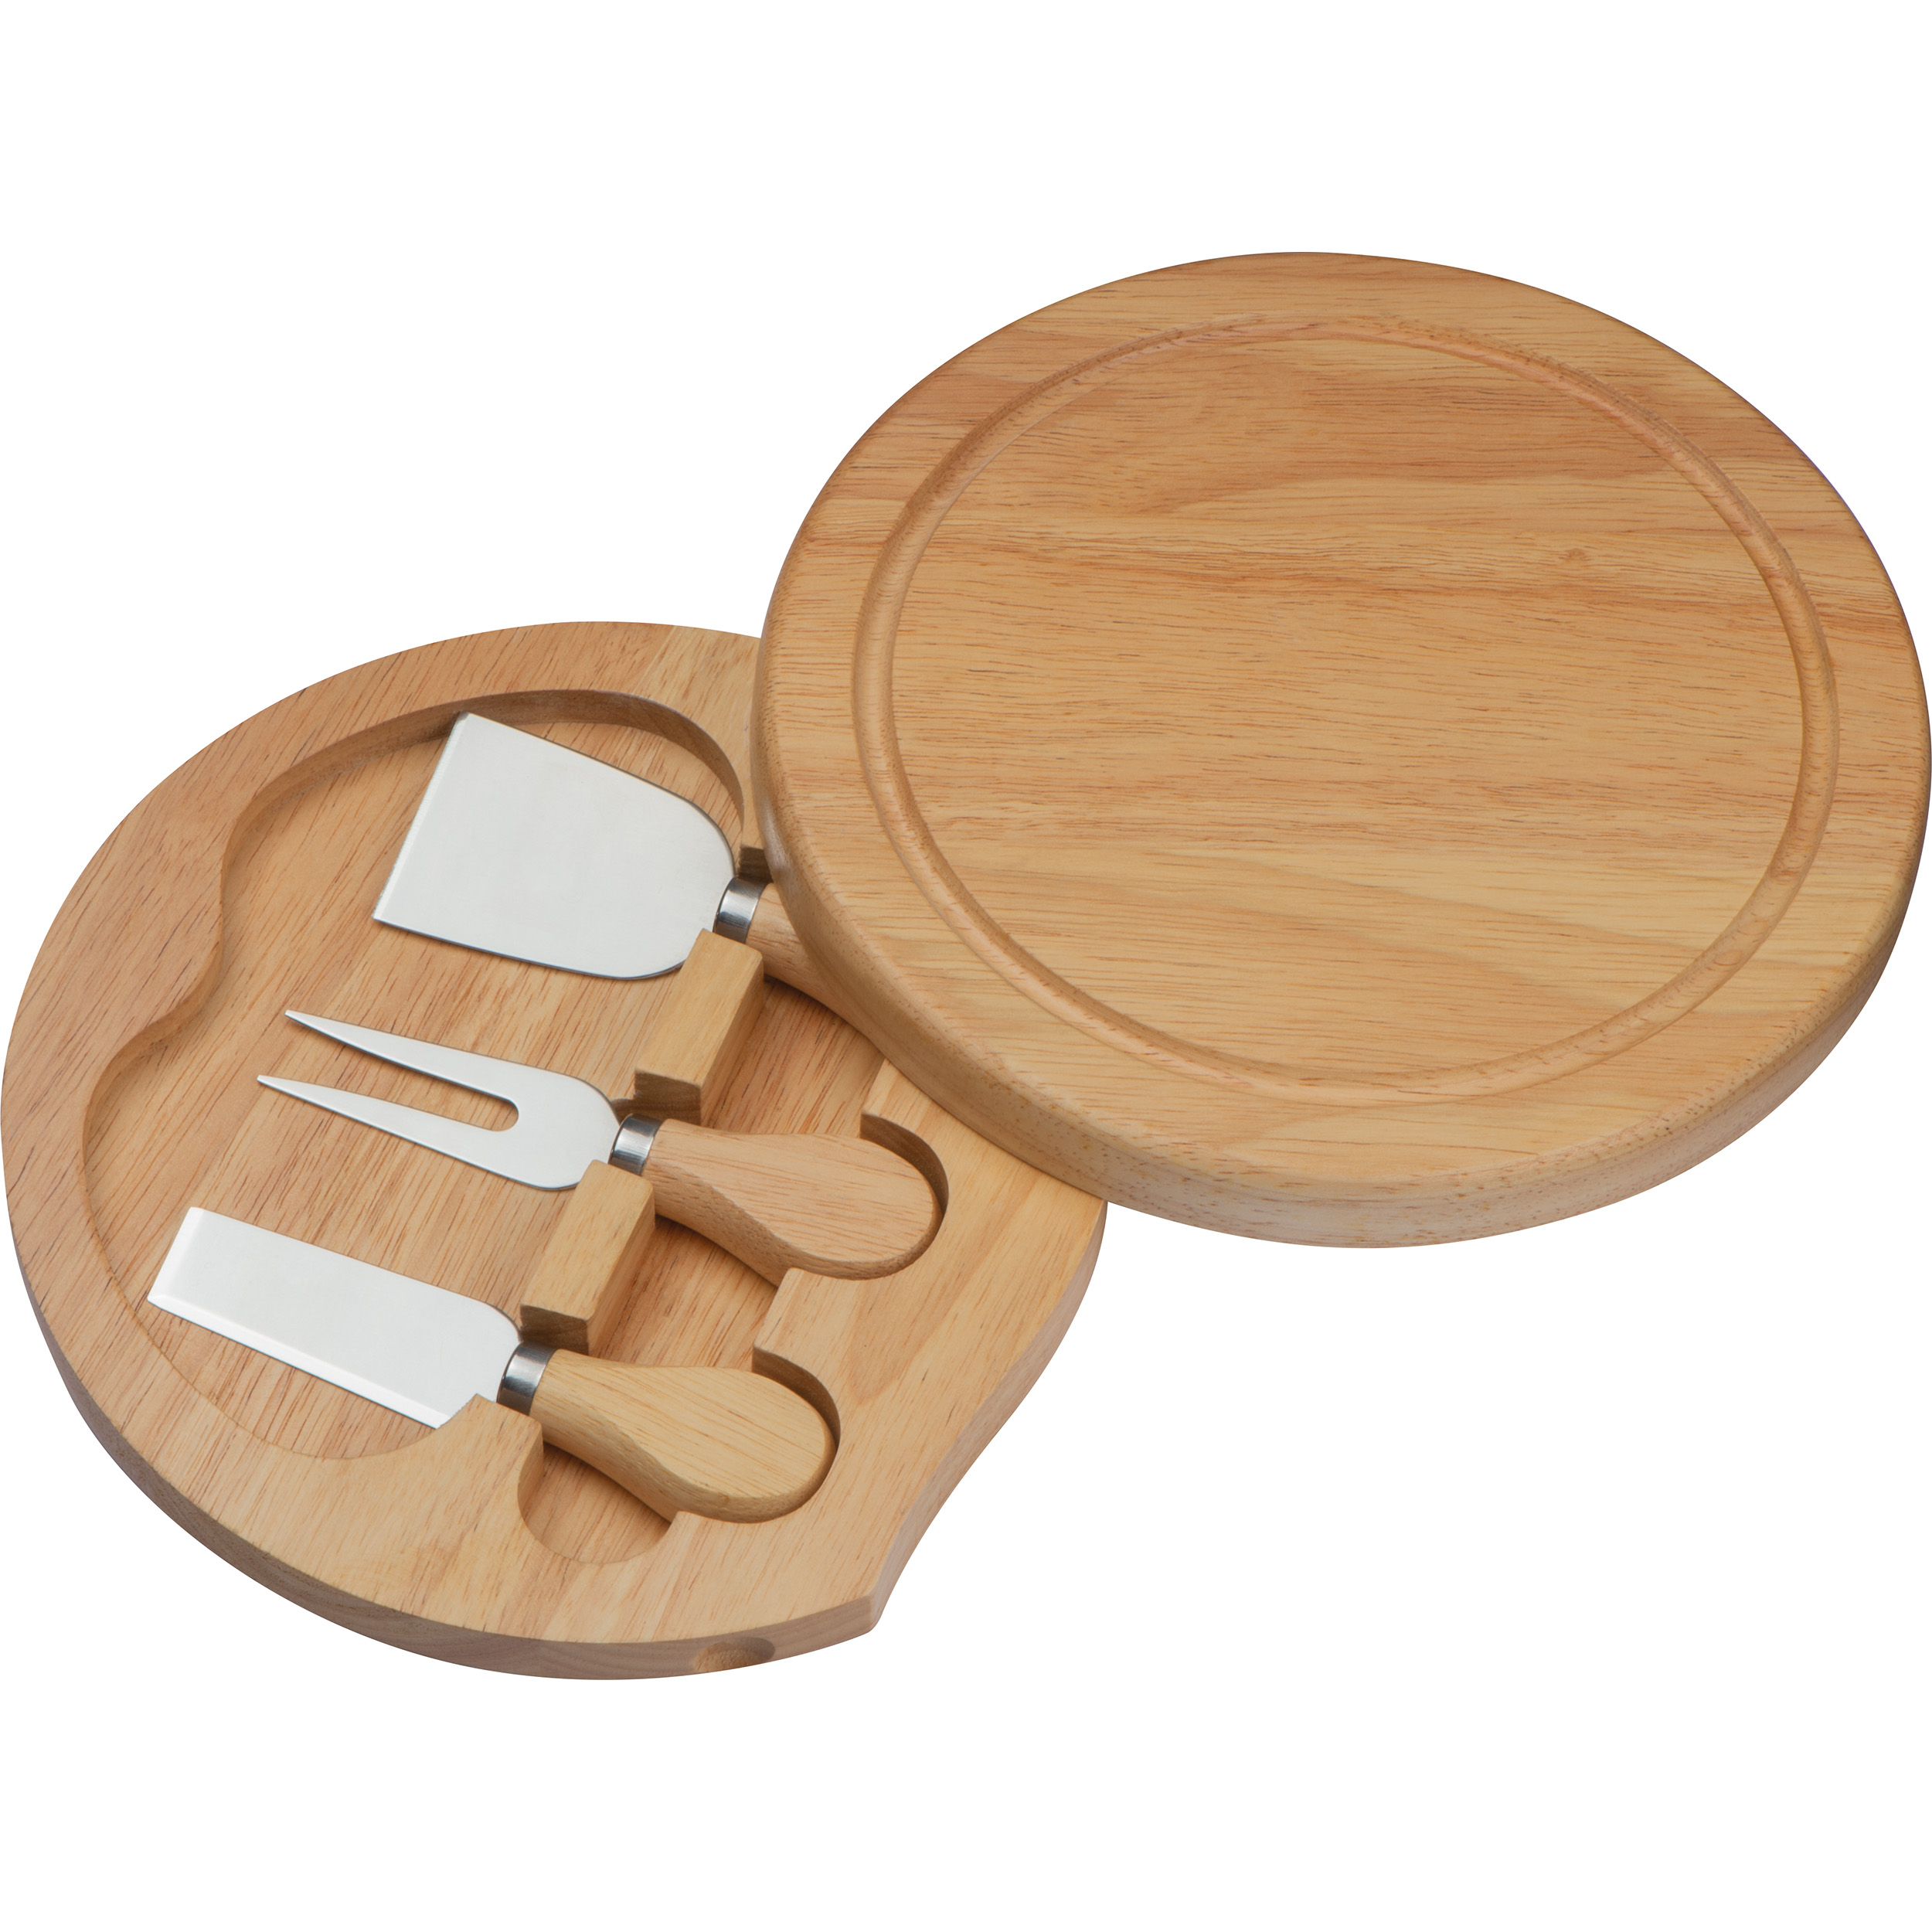 Chopping board made of wood